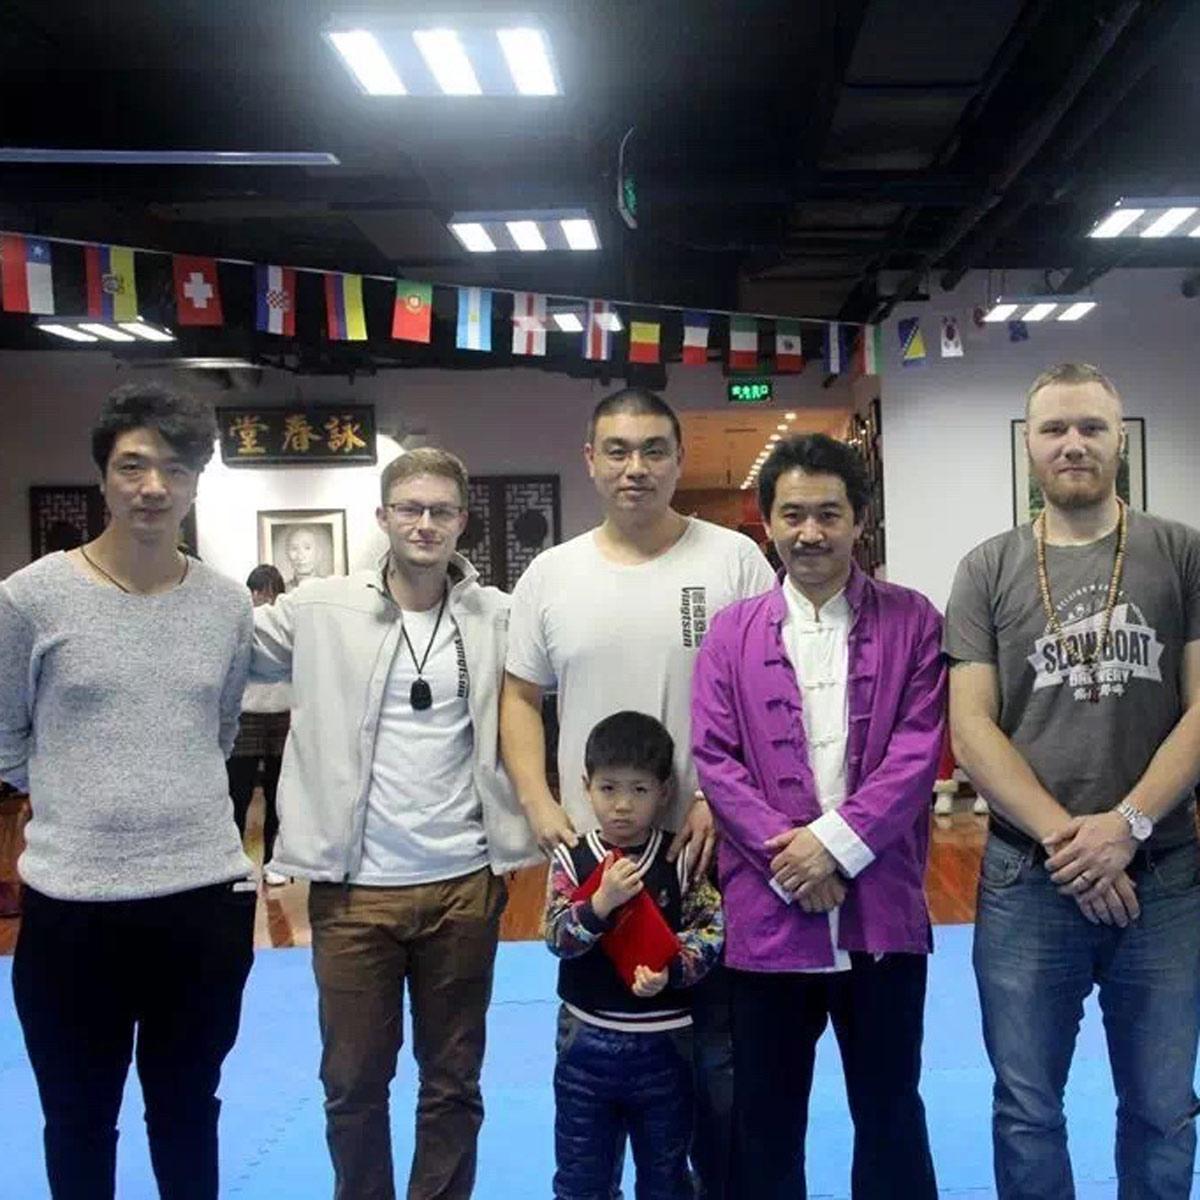 John Alsobrooks with his Martial Arts Master Wang Zhi Peng